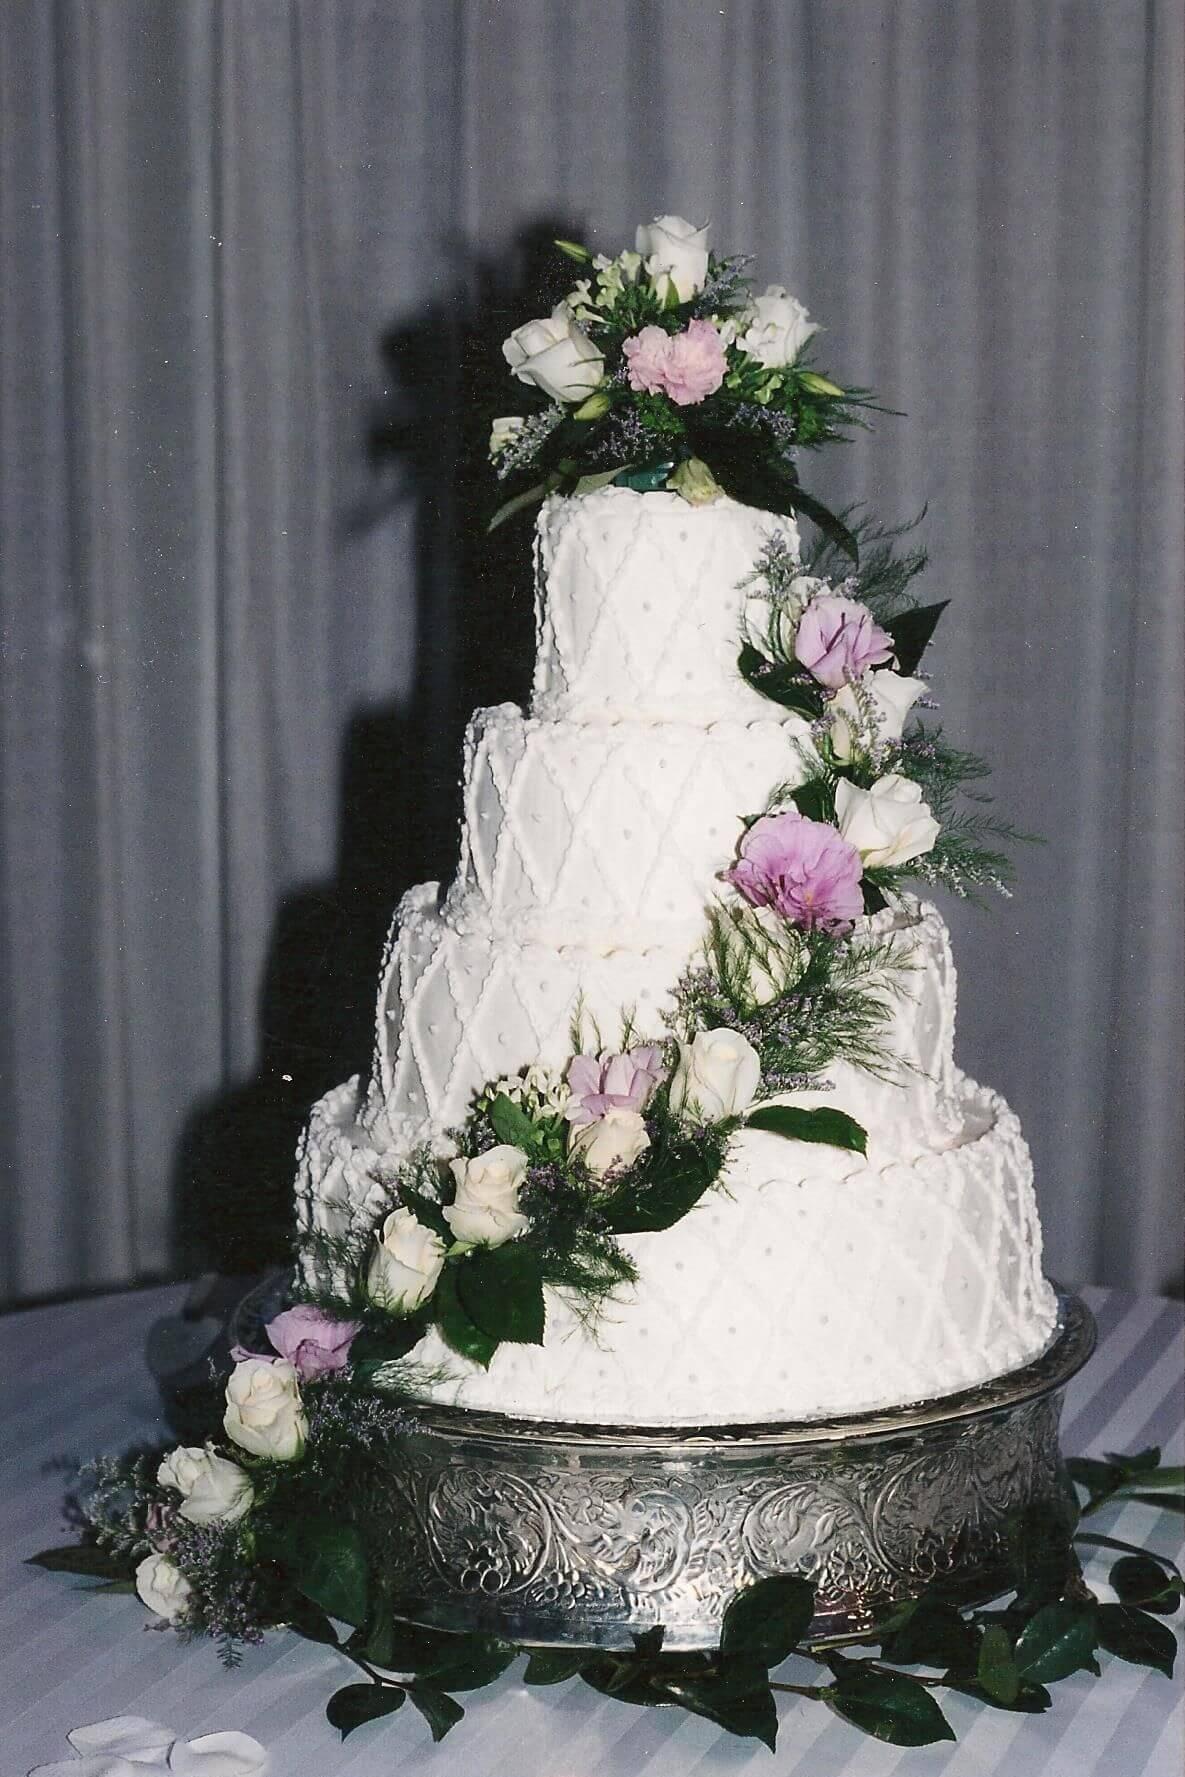 Round Silver Plateau under a wedding cake